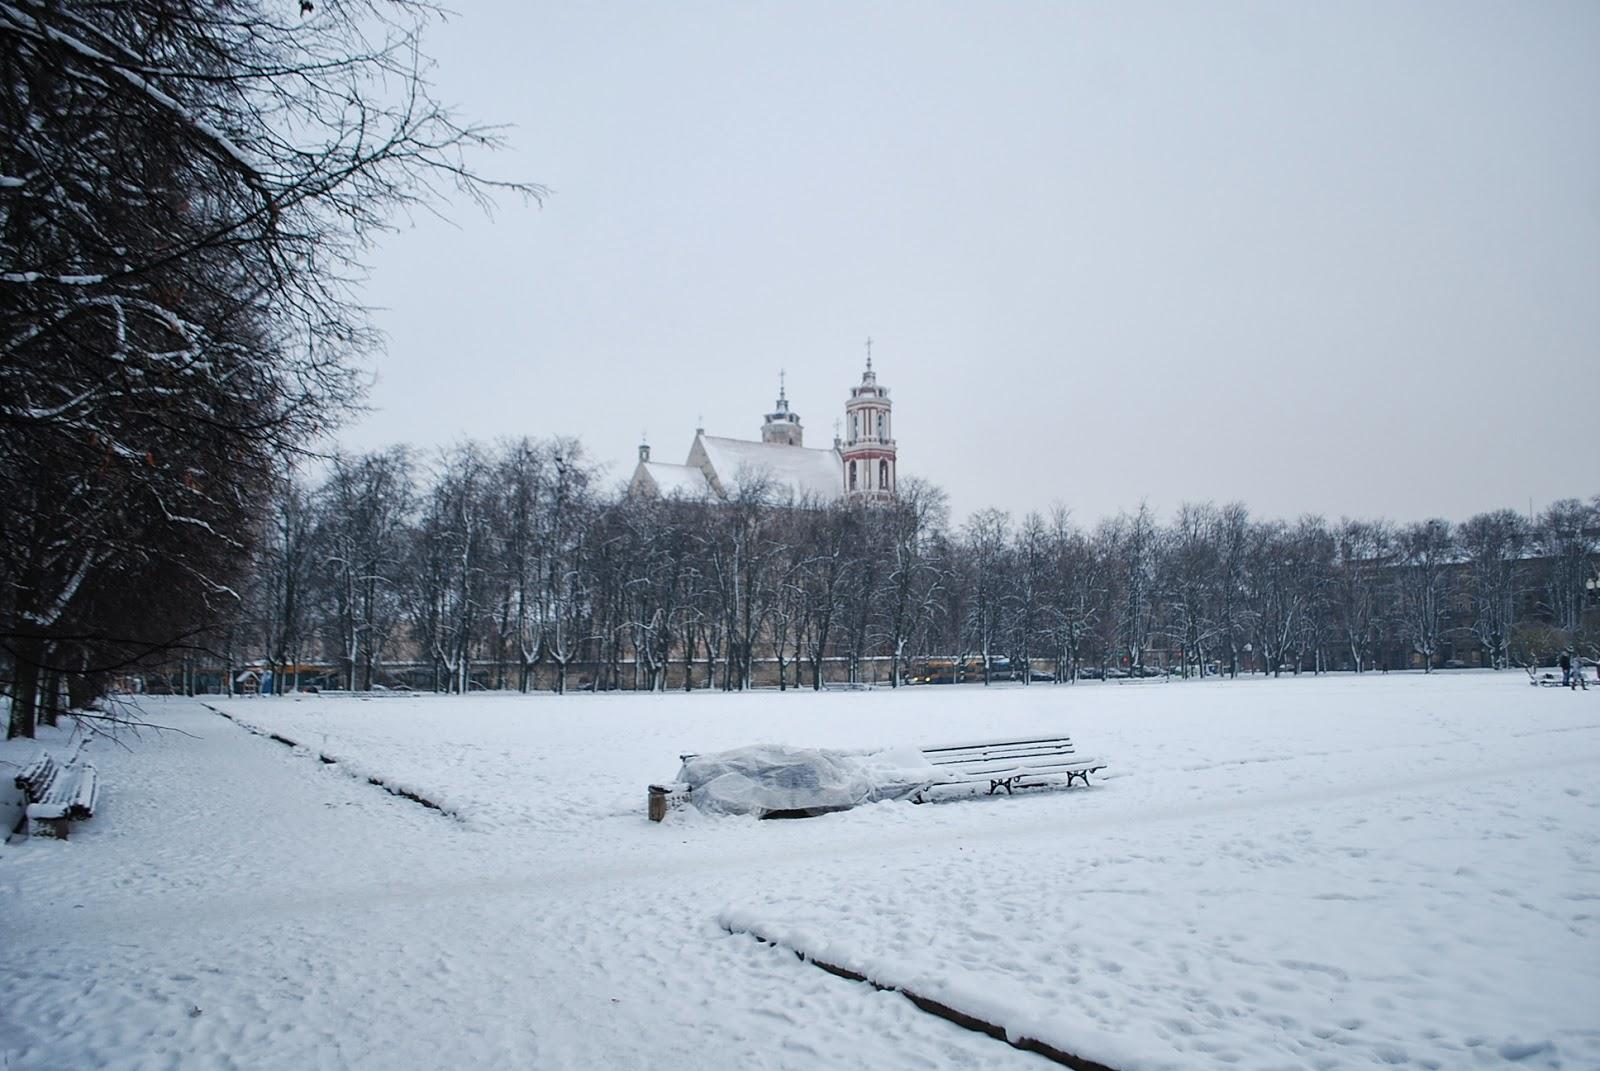 Ночлежка бездомного на лавочке практически в центре Вильнюса.